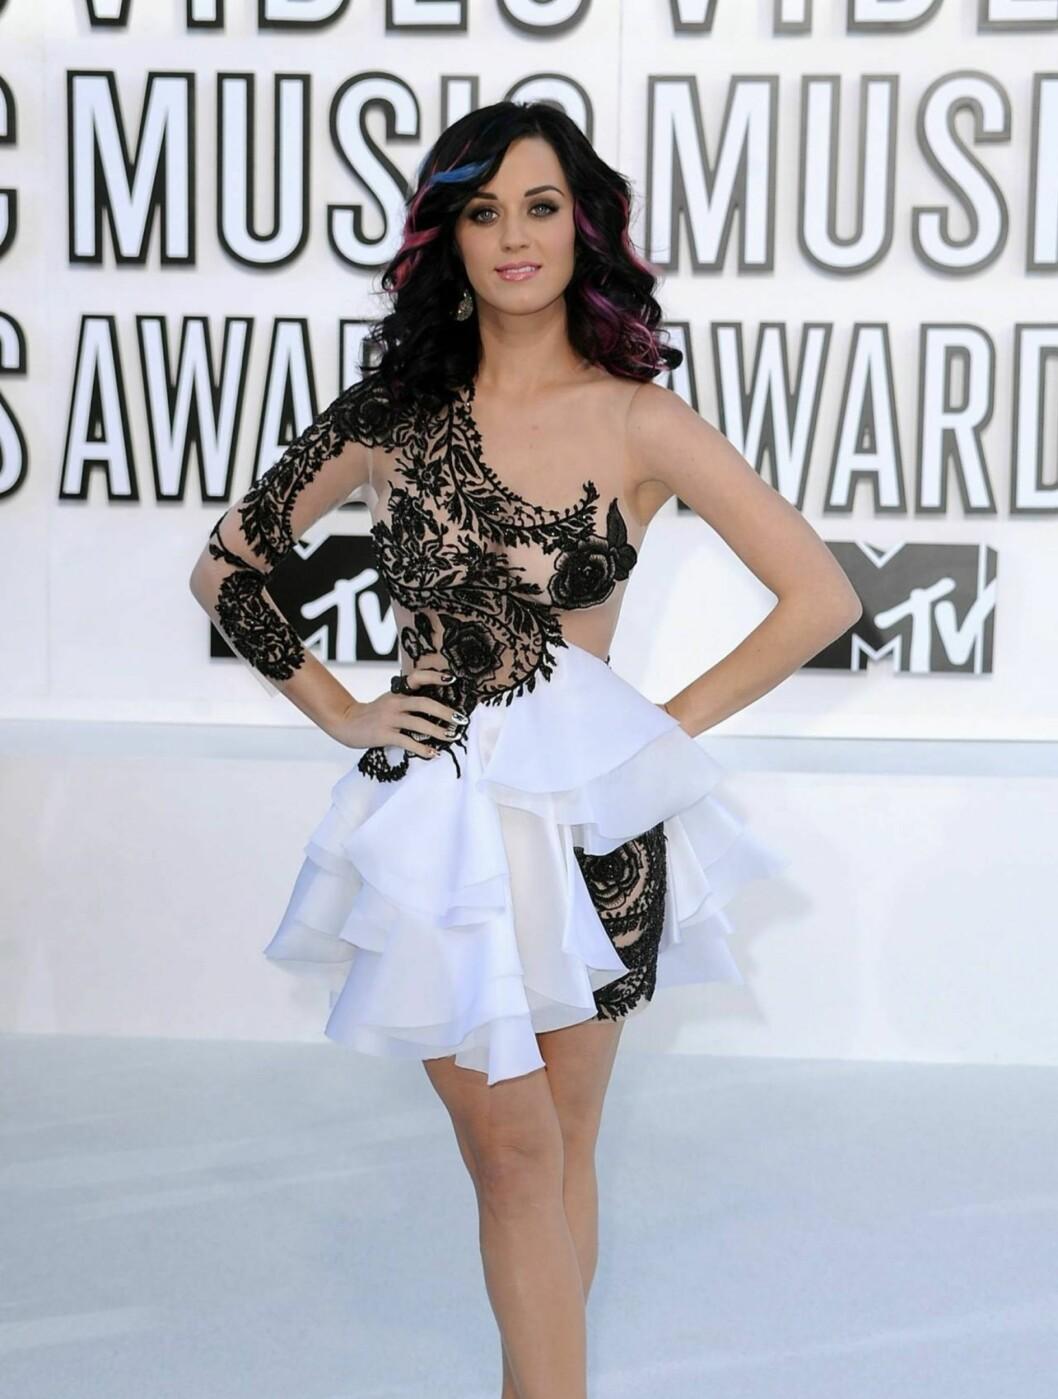 VERST: Popstjernen Katy Perry hadde farget håret i all regnbuens farger. Foto: All Over Press